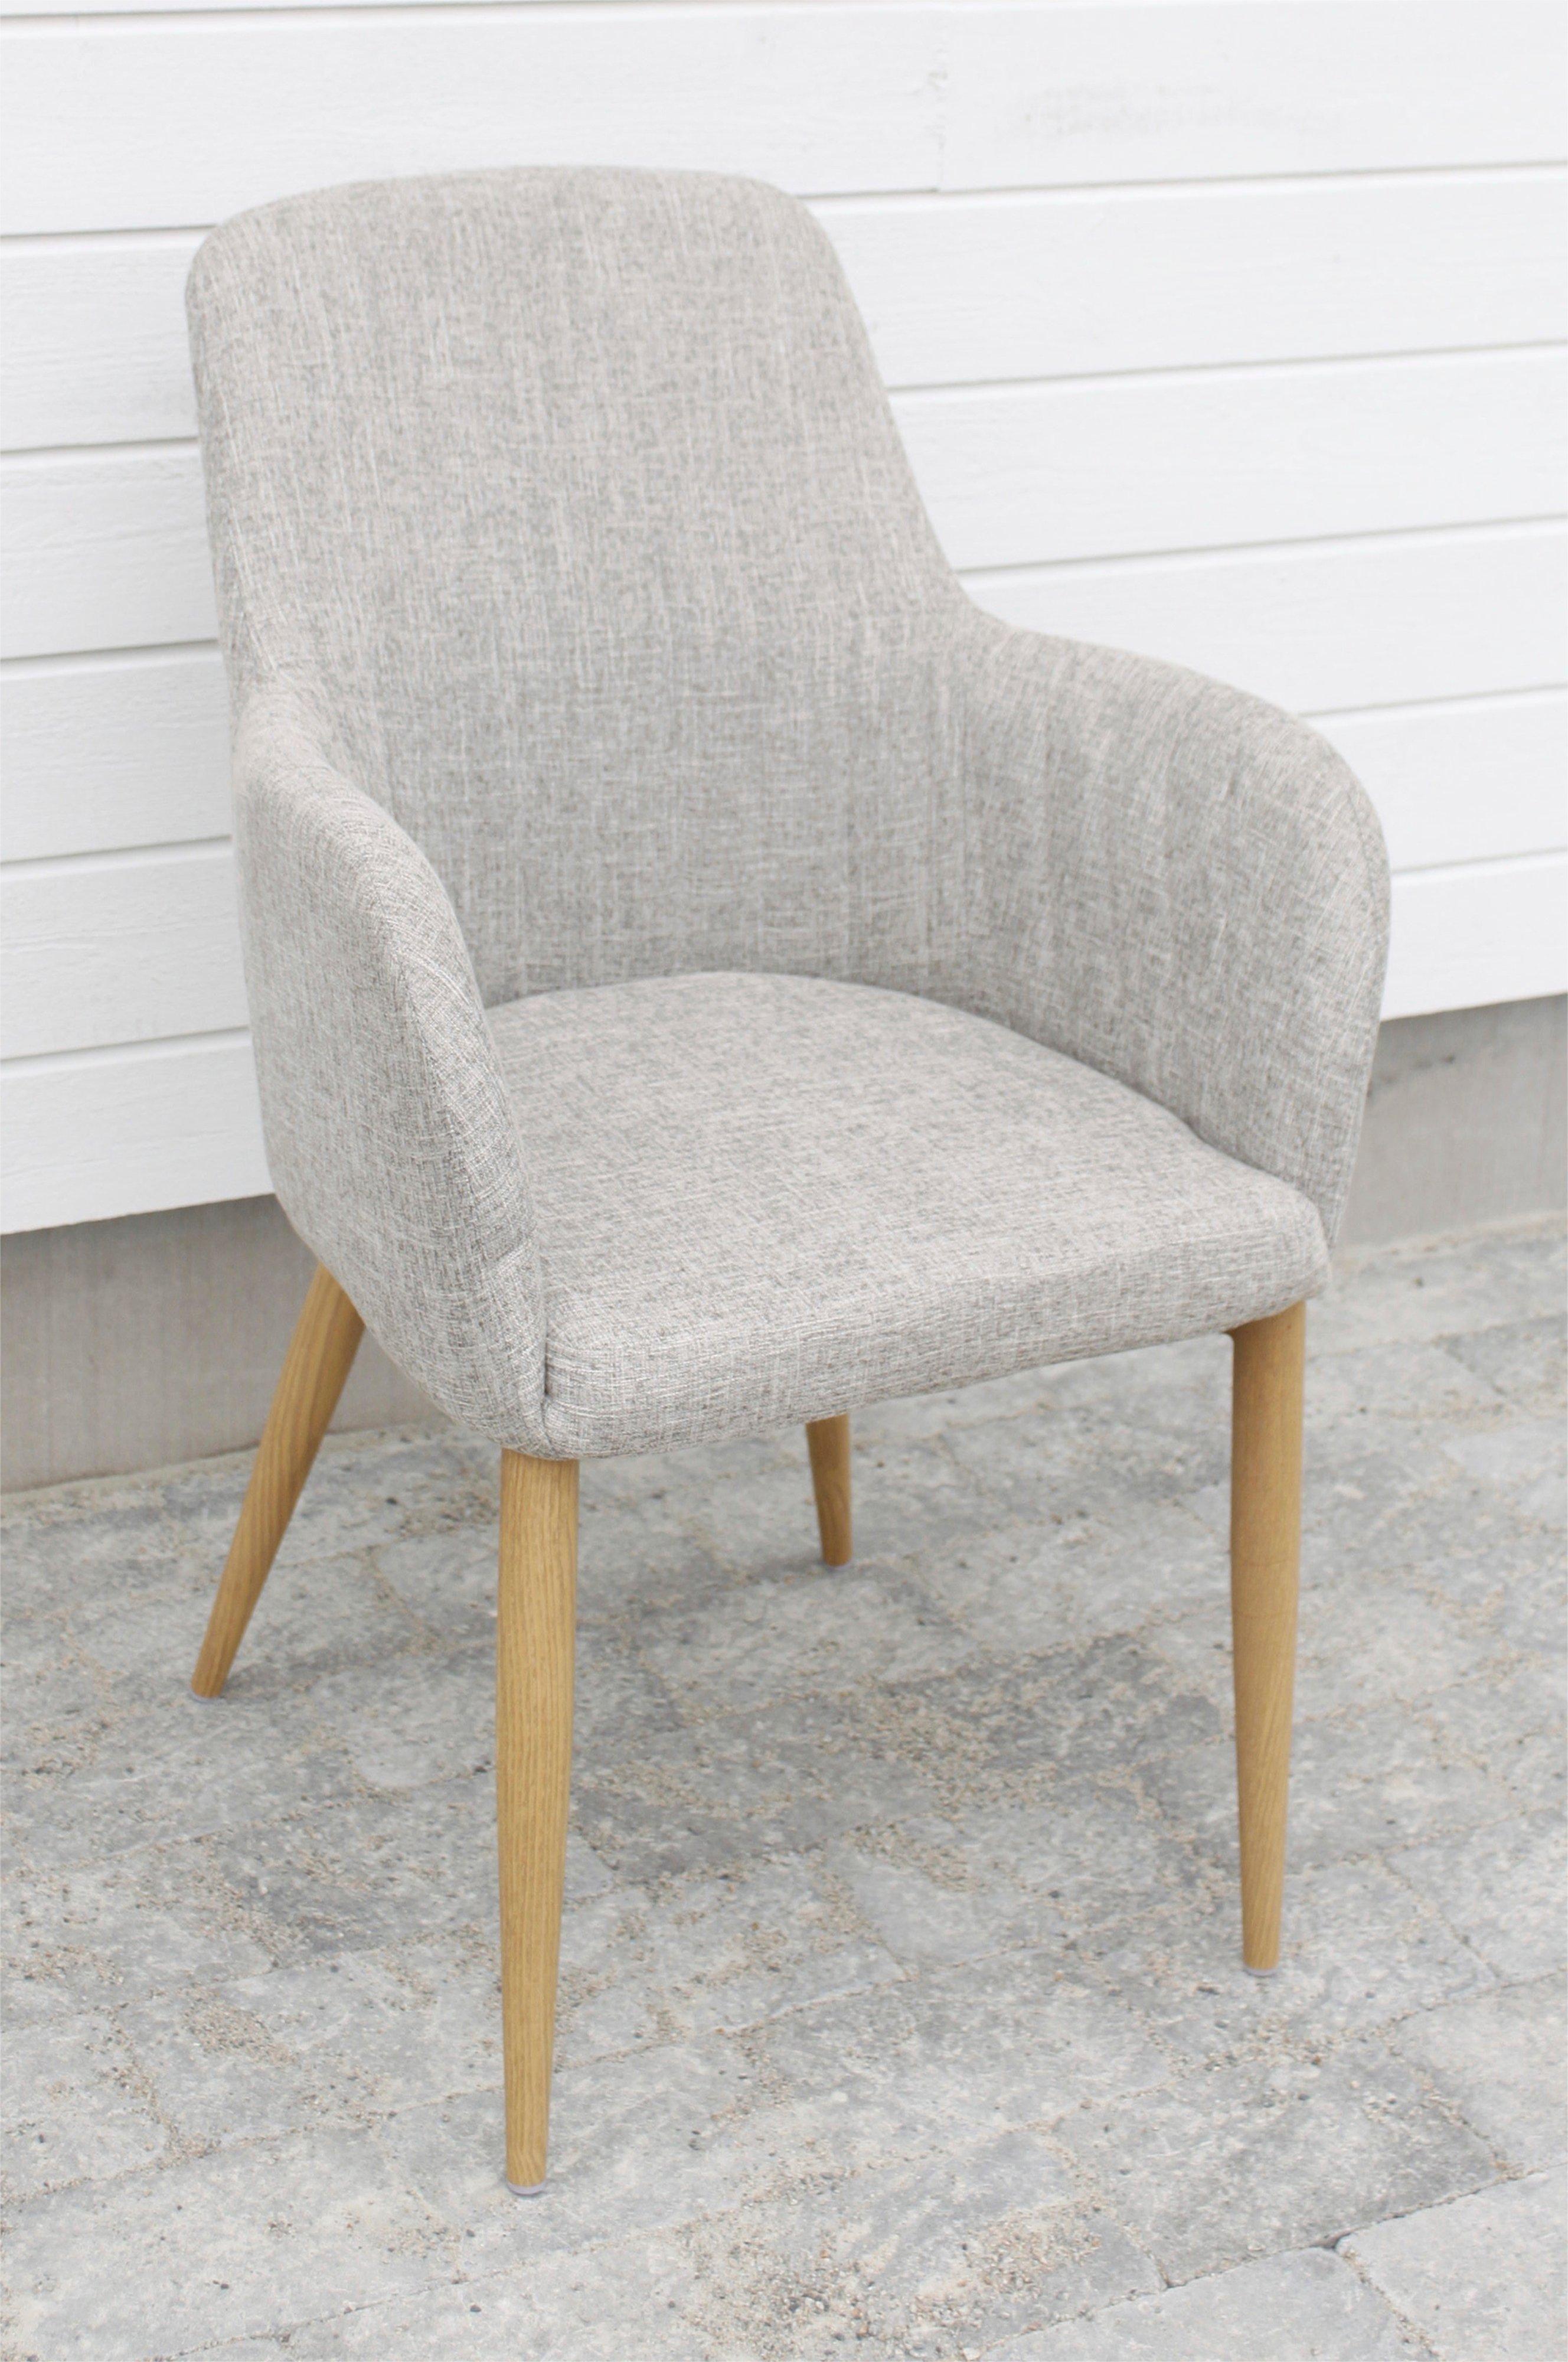 Stol Comfort 2 Pk Furniture Home Home Decor